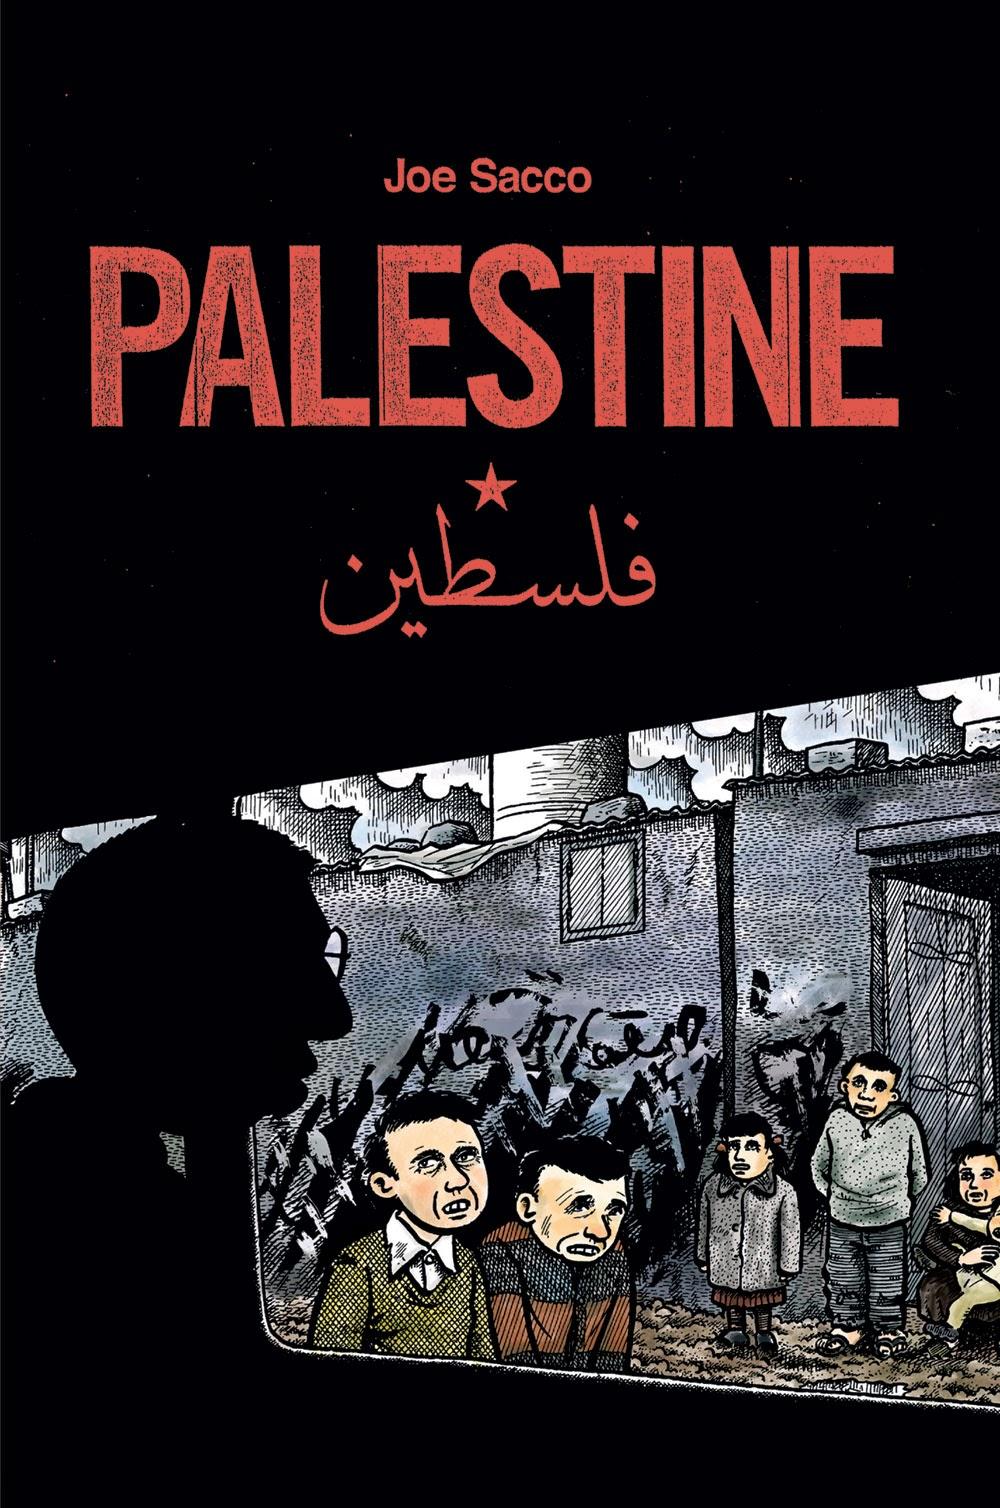 Обложка «Палестины». Источник: сайт share.america.gov